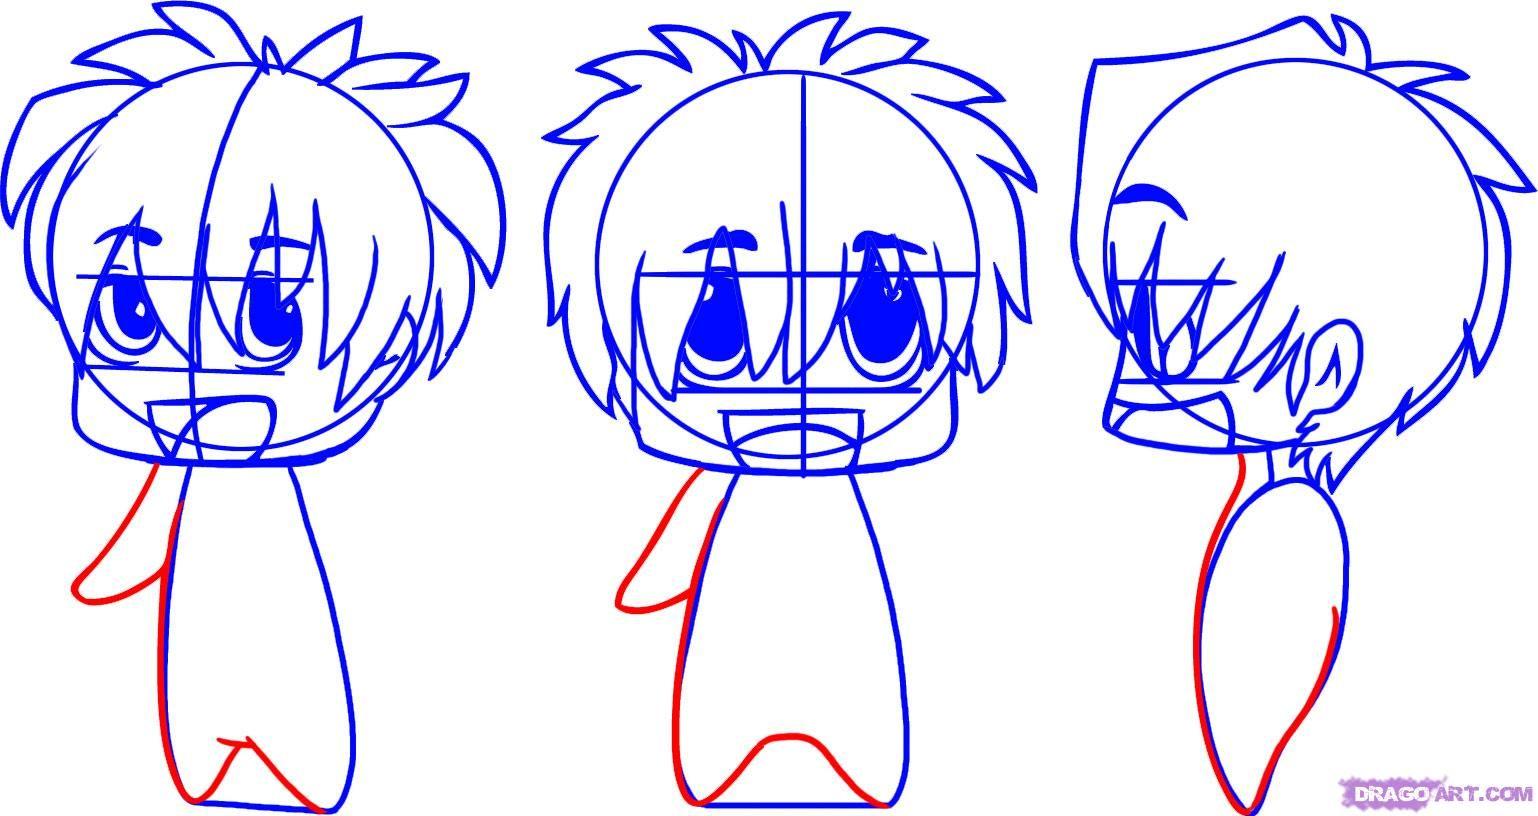 How To Draw Chibi Anime? | Shijufasu's Blog